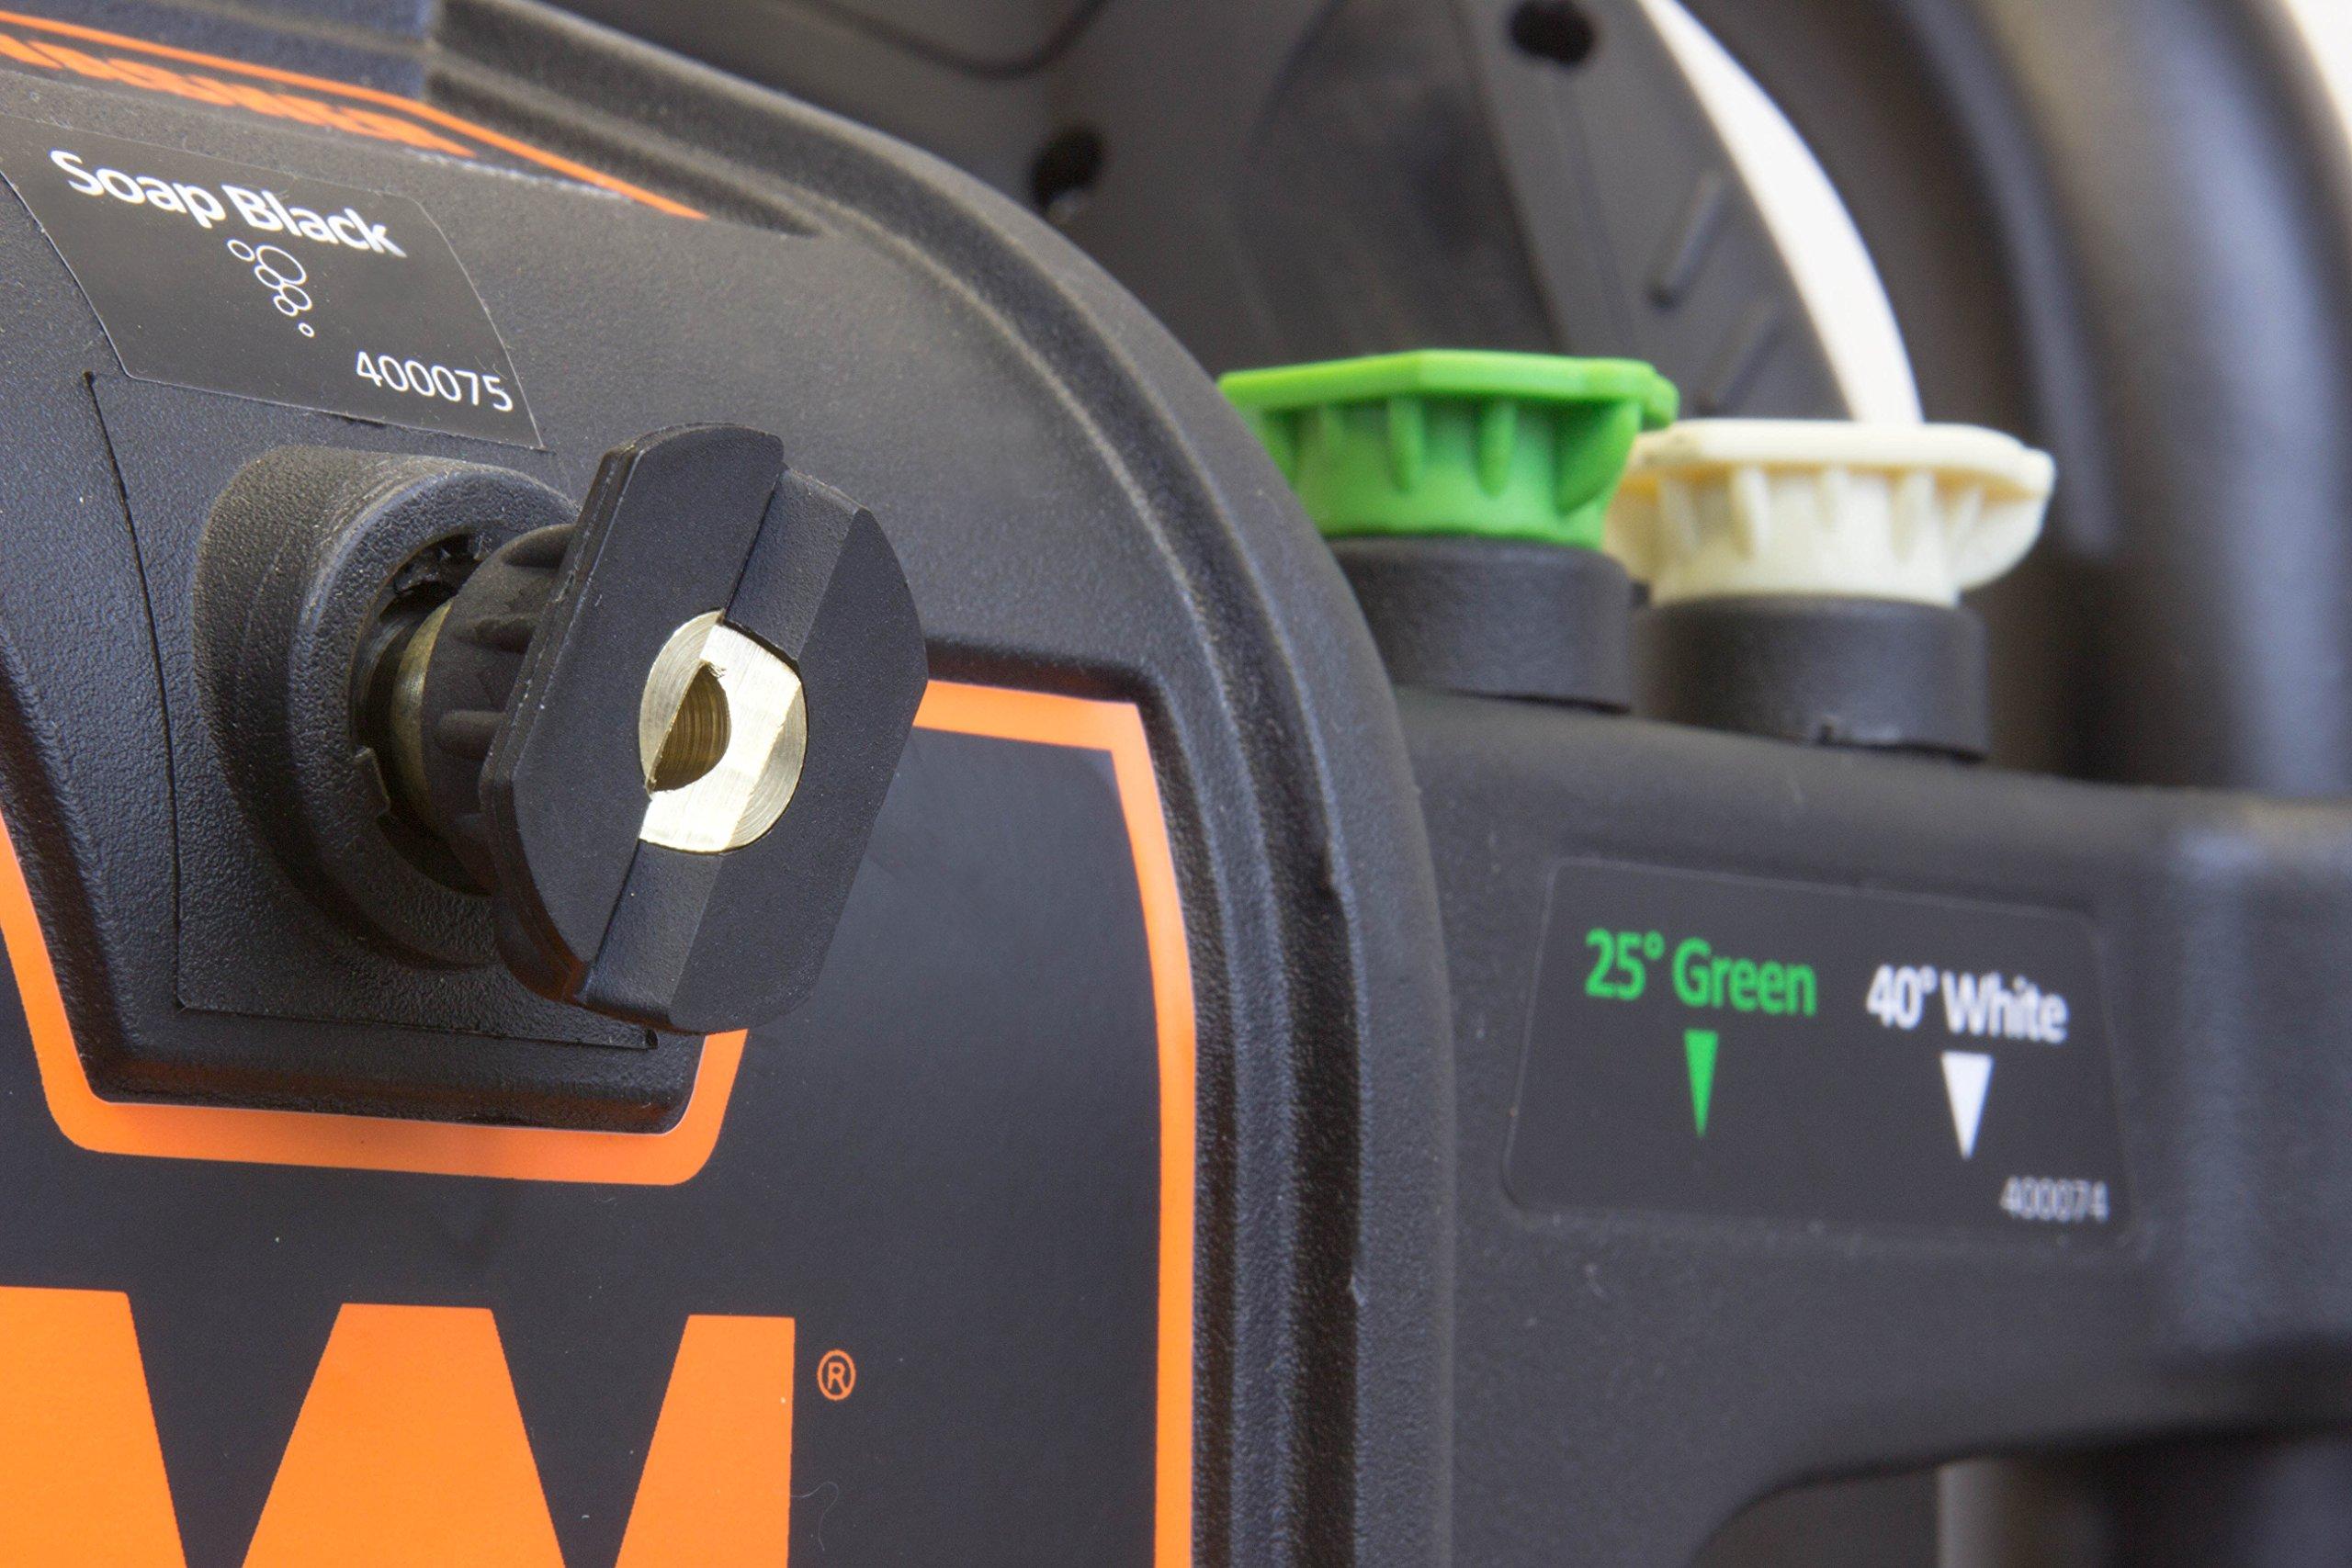 WEN PW31 3100 PSI Gas Pressure Washer, 208 cc by WEN (Image #3)